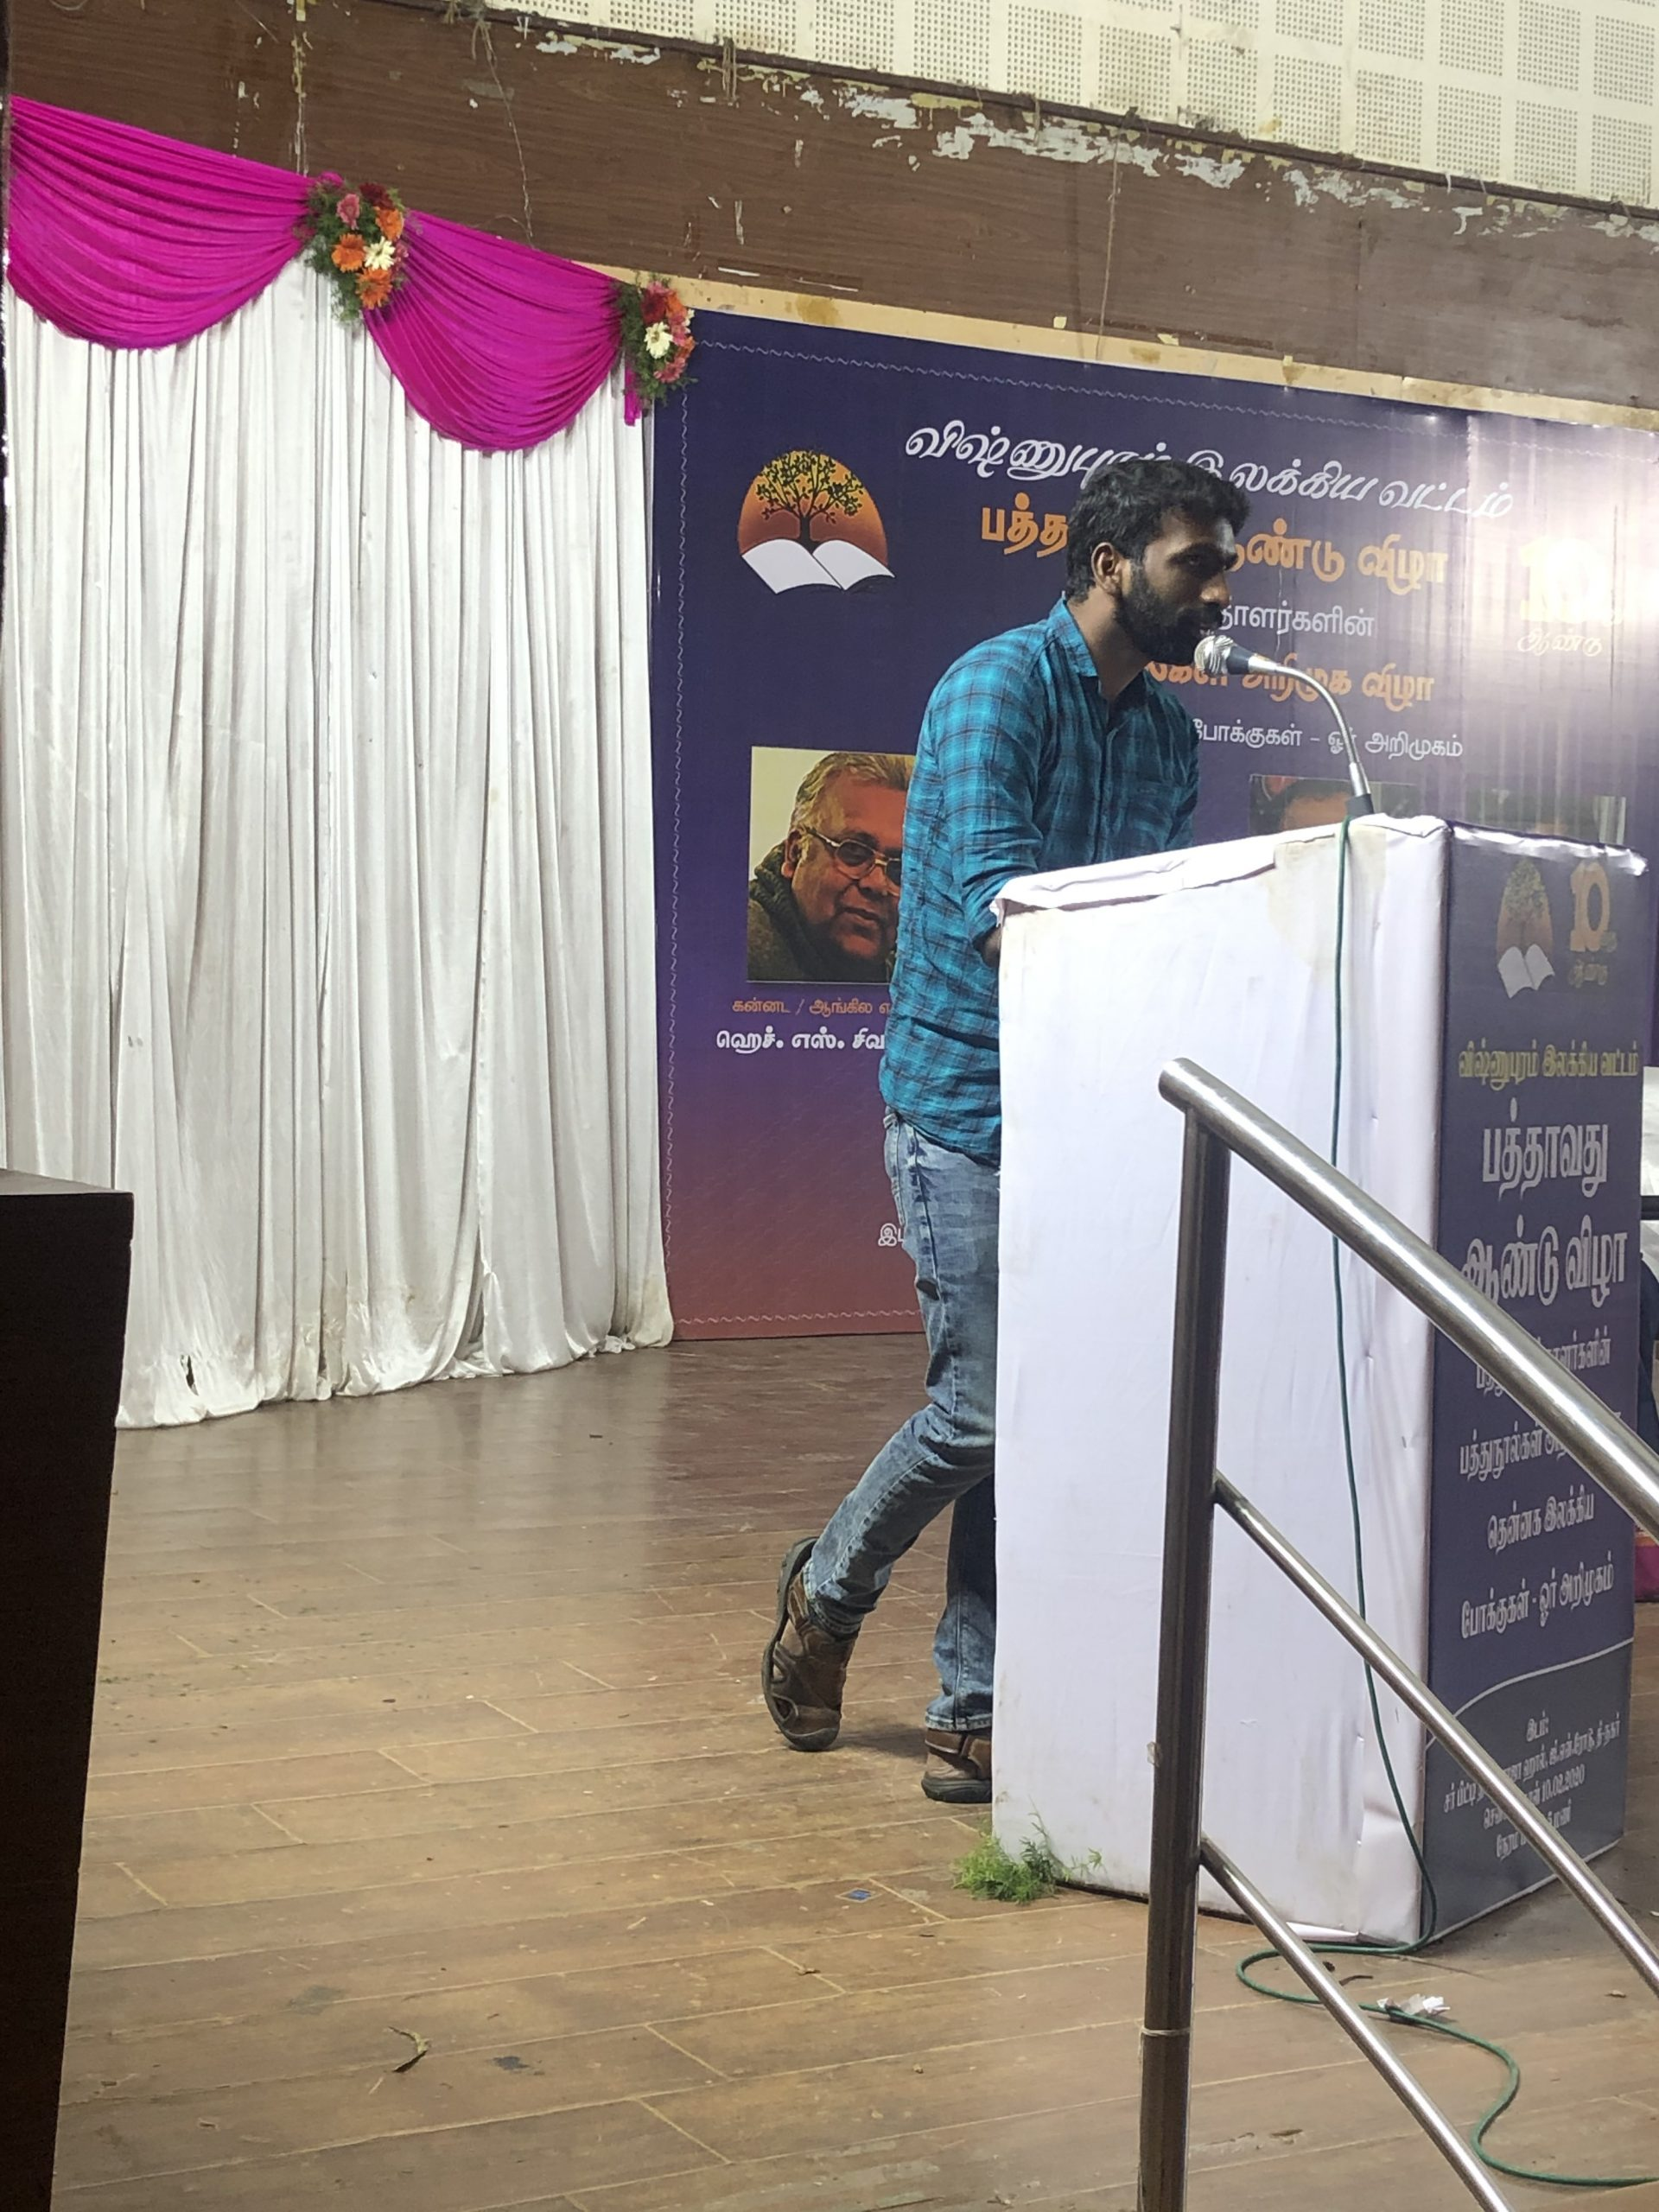 naveen on nagaprakash's short stories